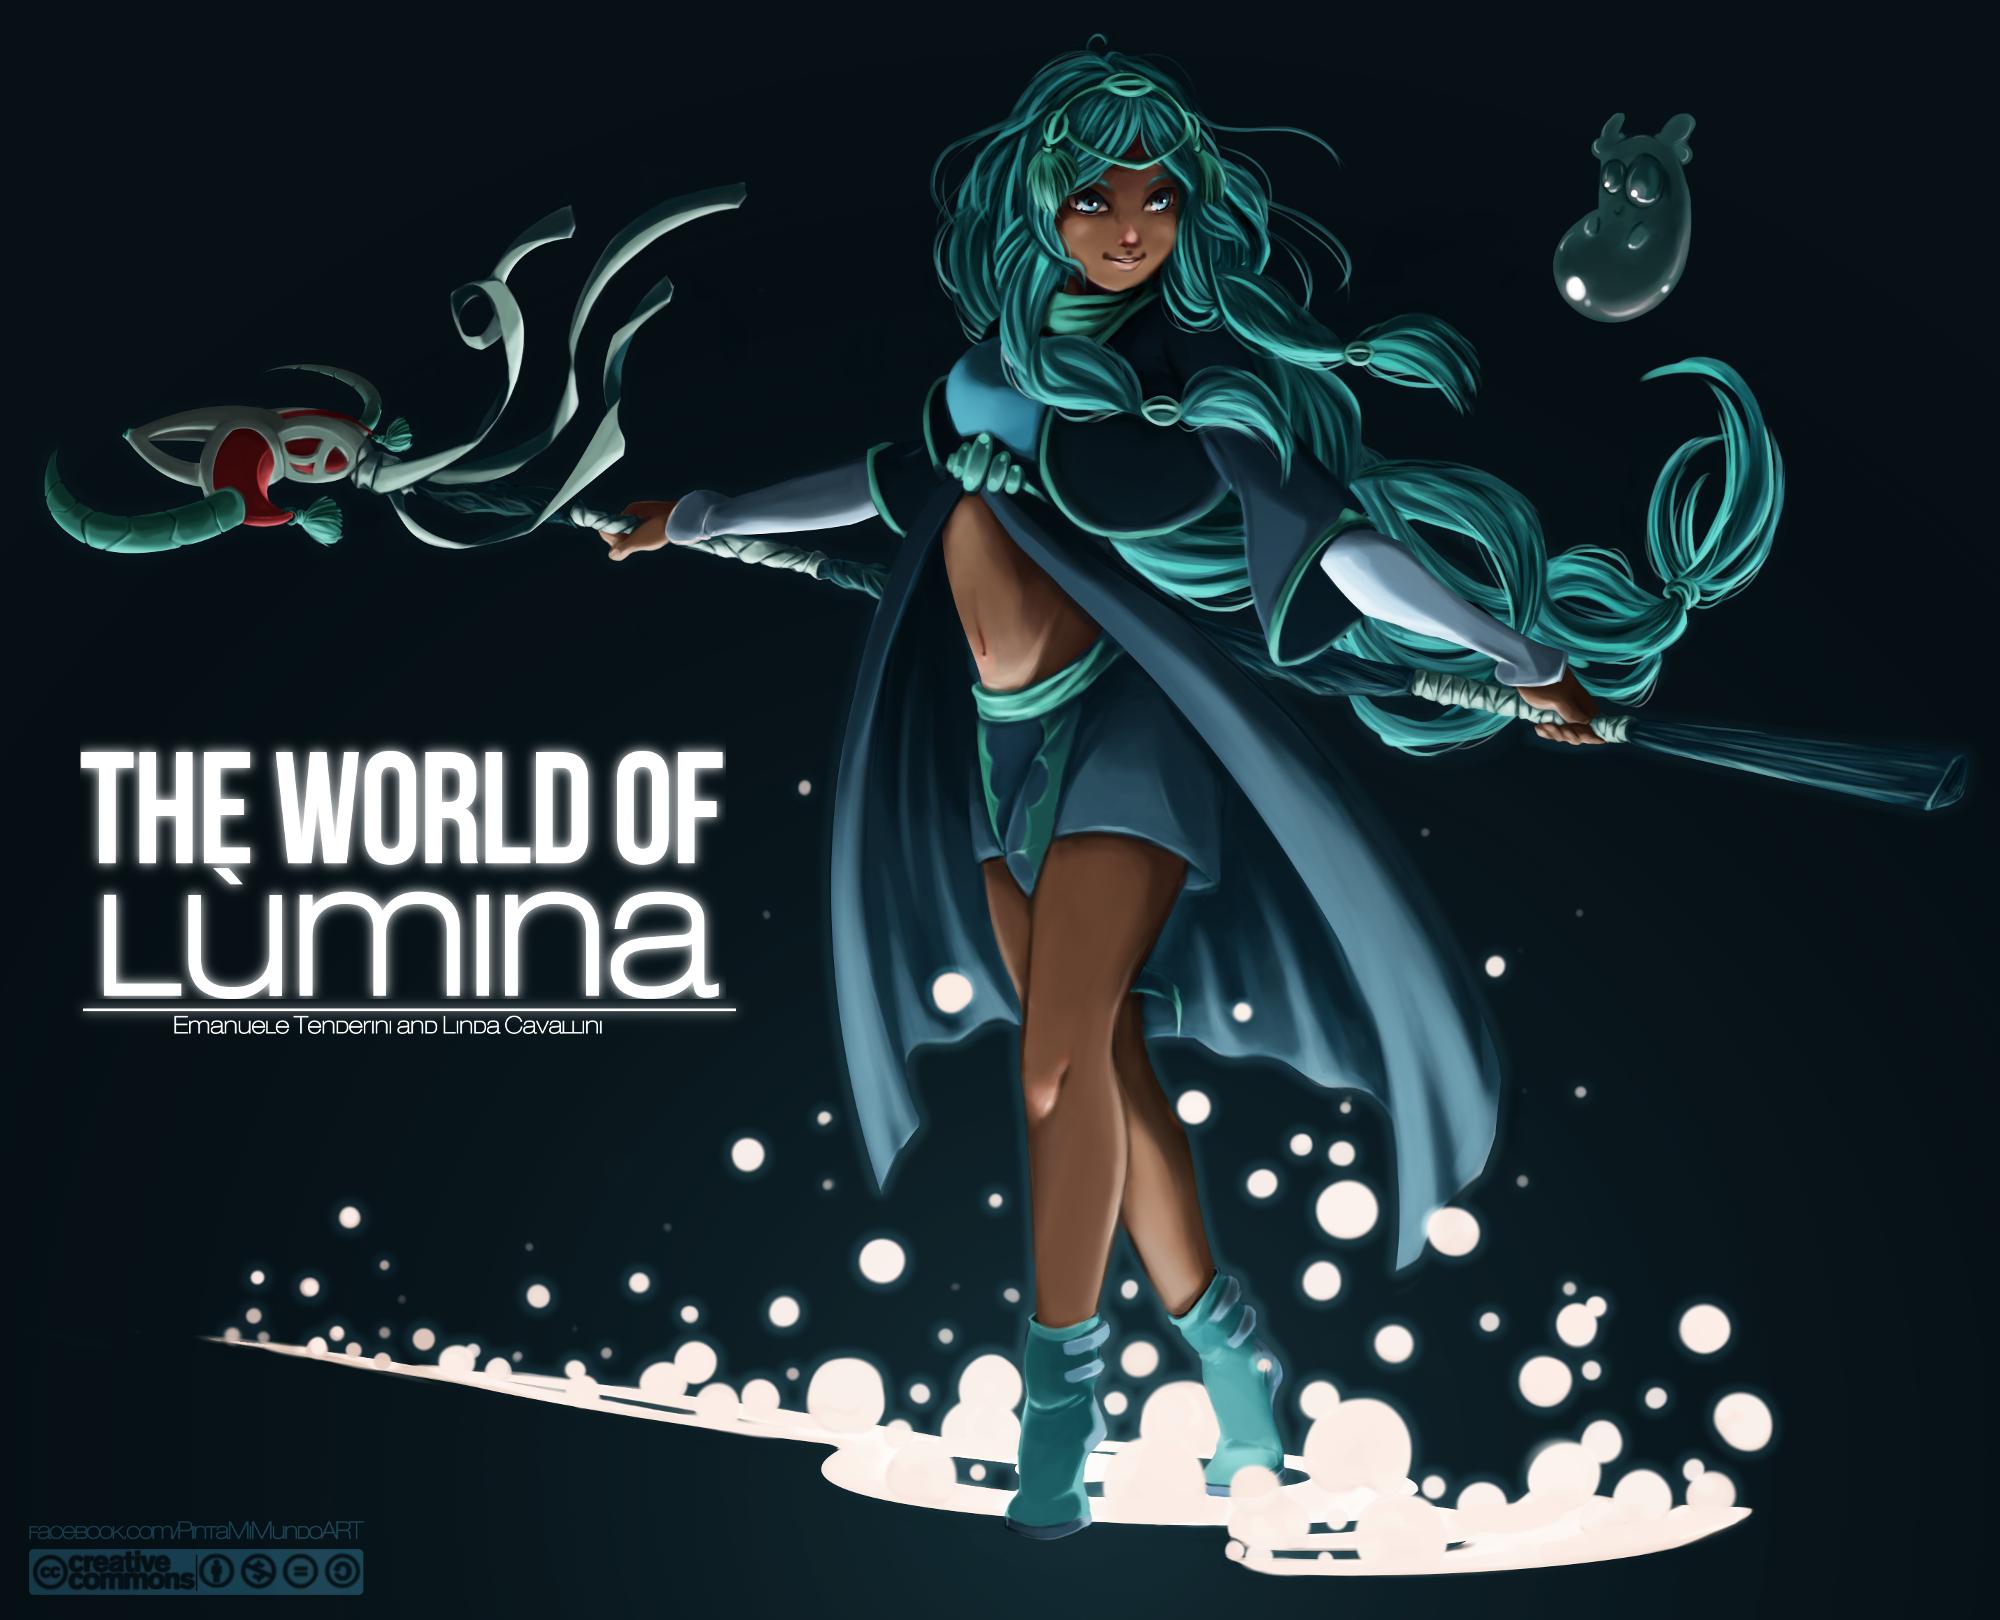 Shina - The world of Lùmina